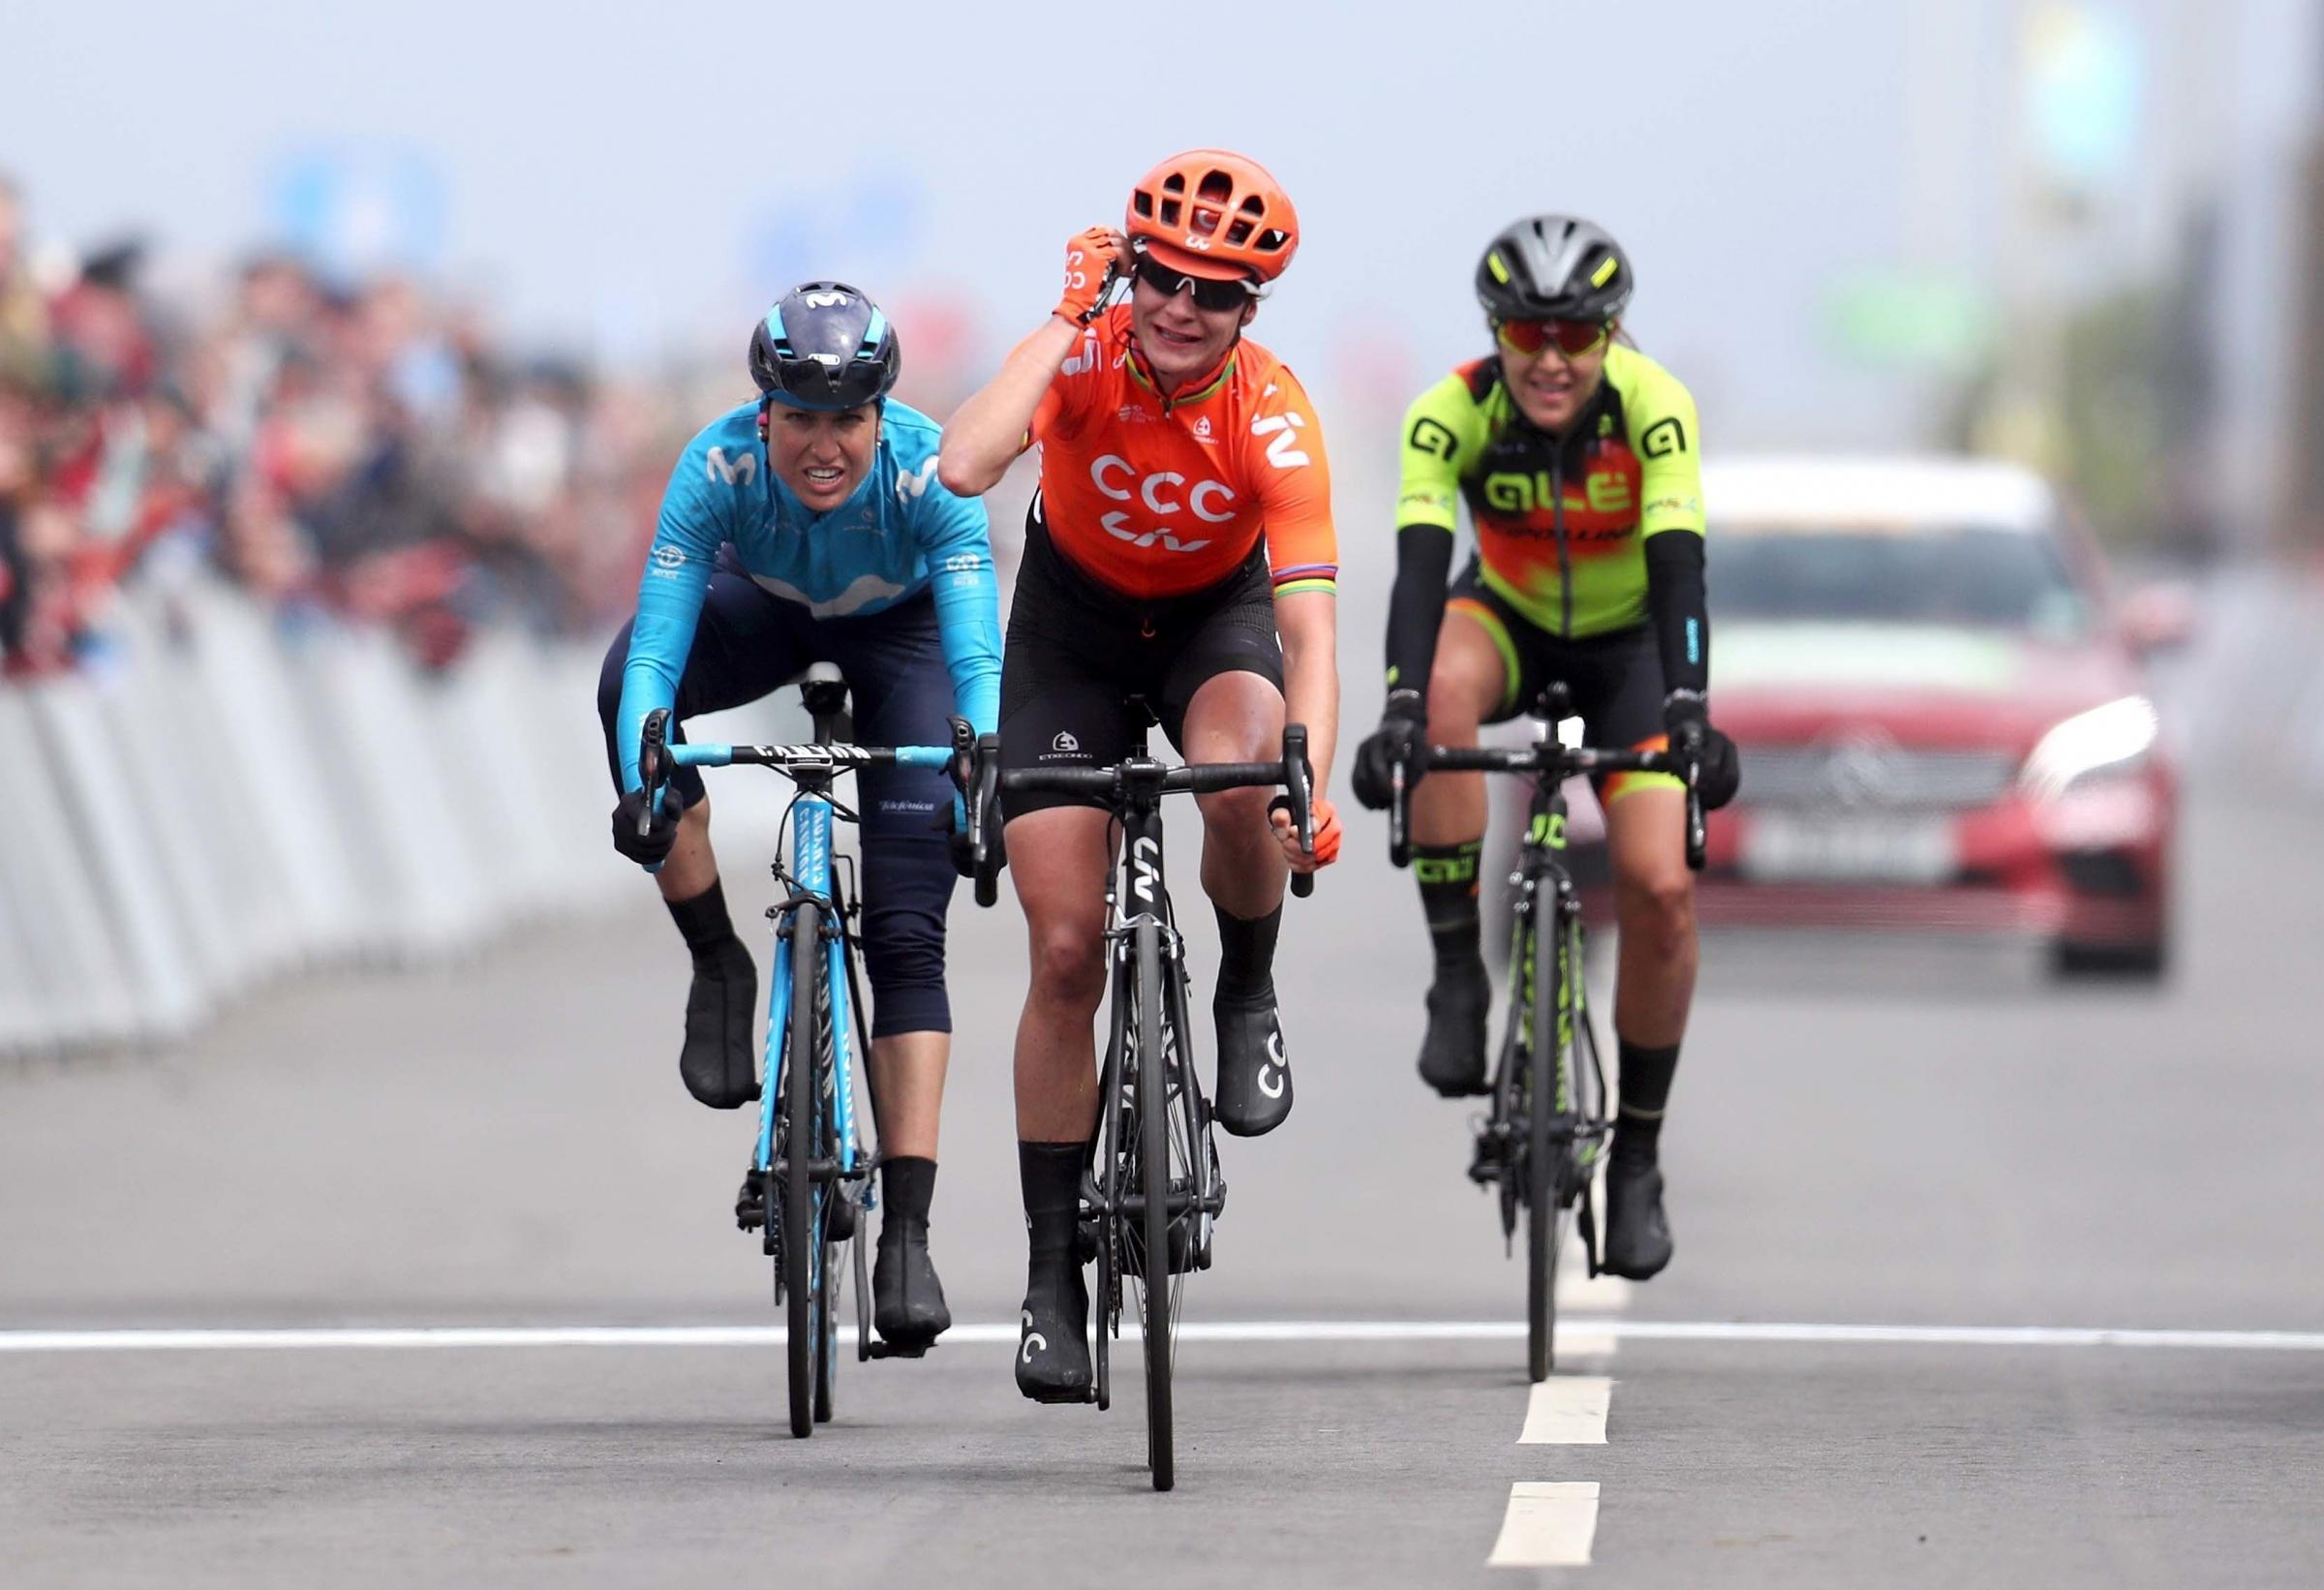 Vos adds Women's Tour de Yorkshire to long list of accolades